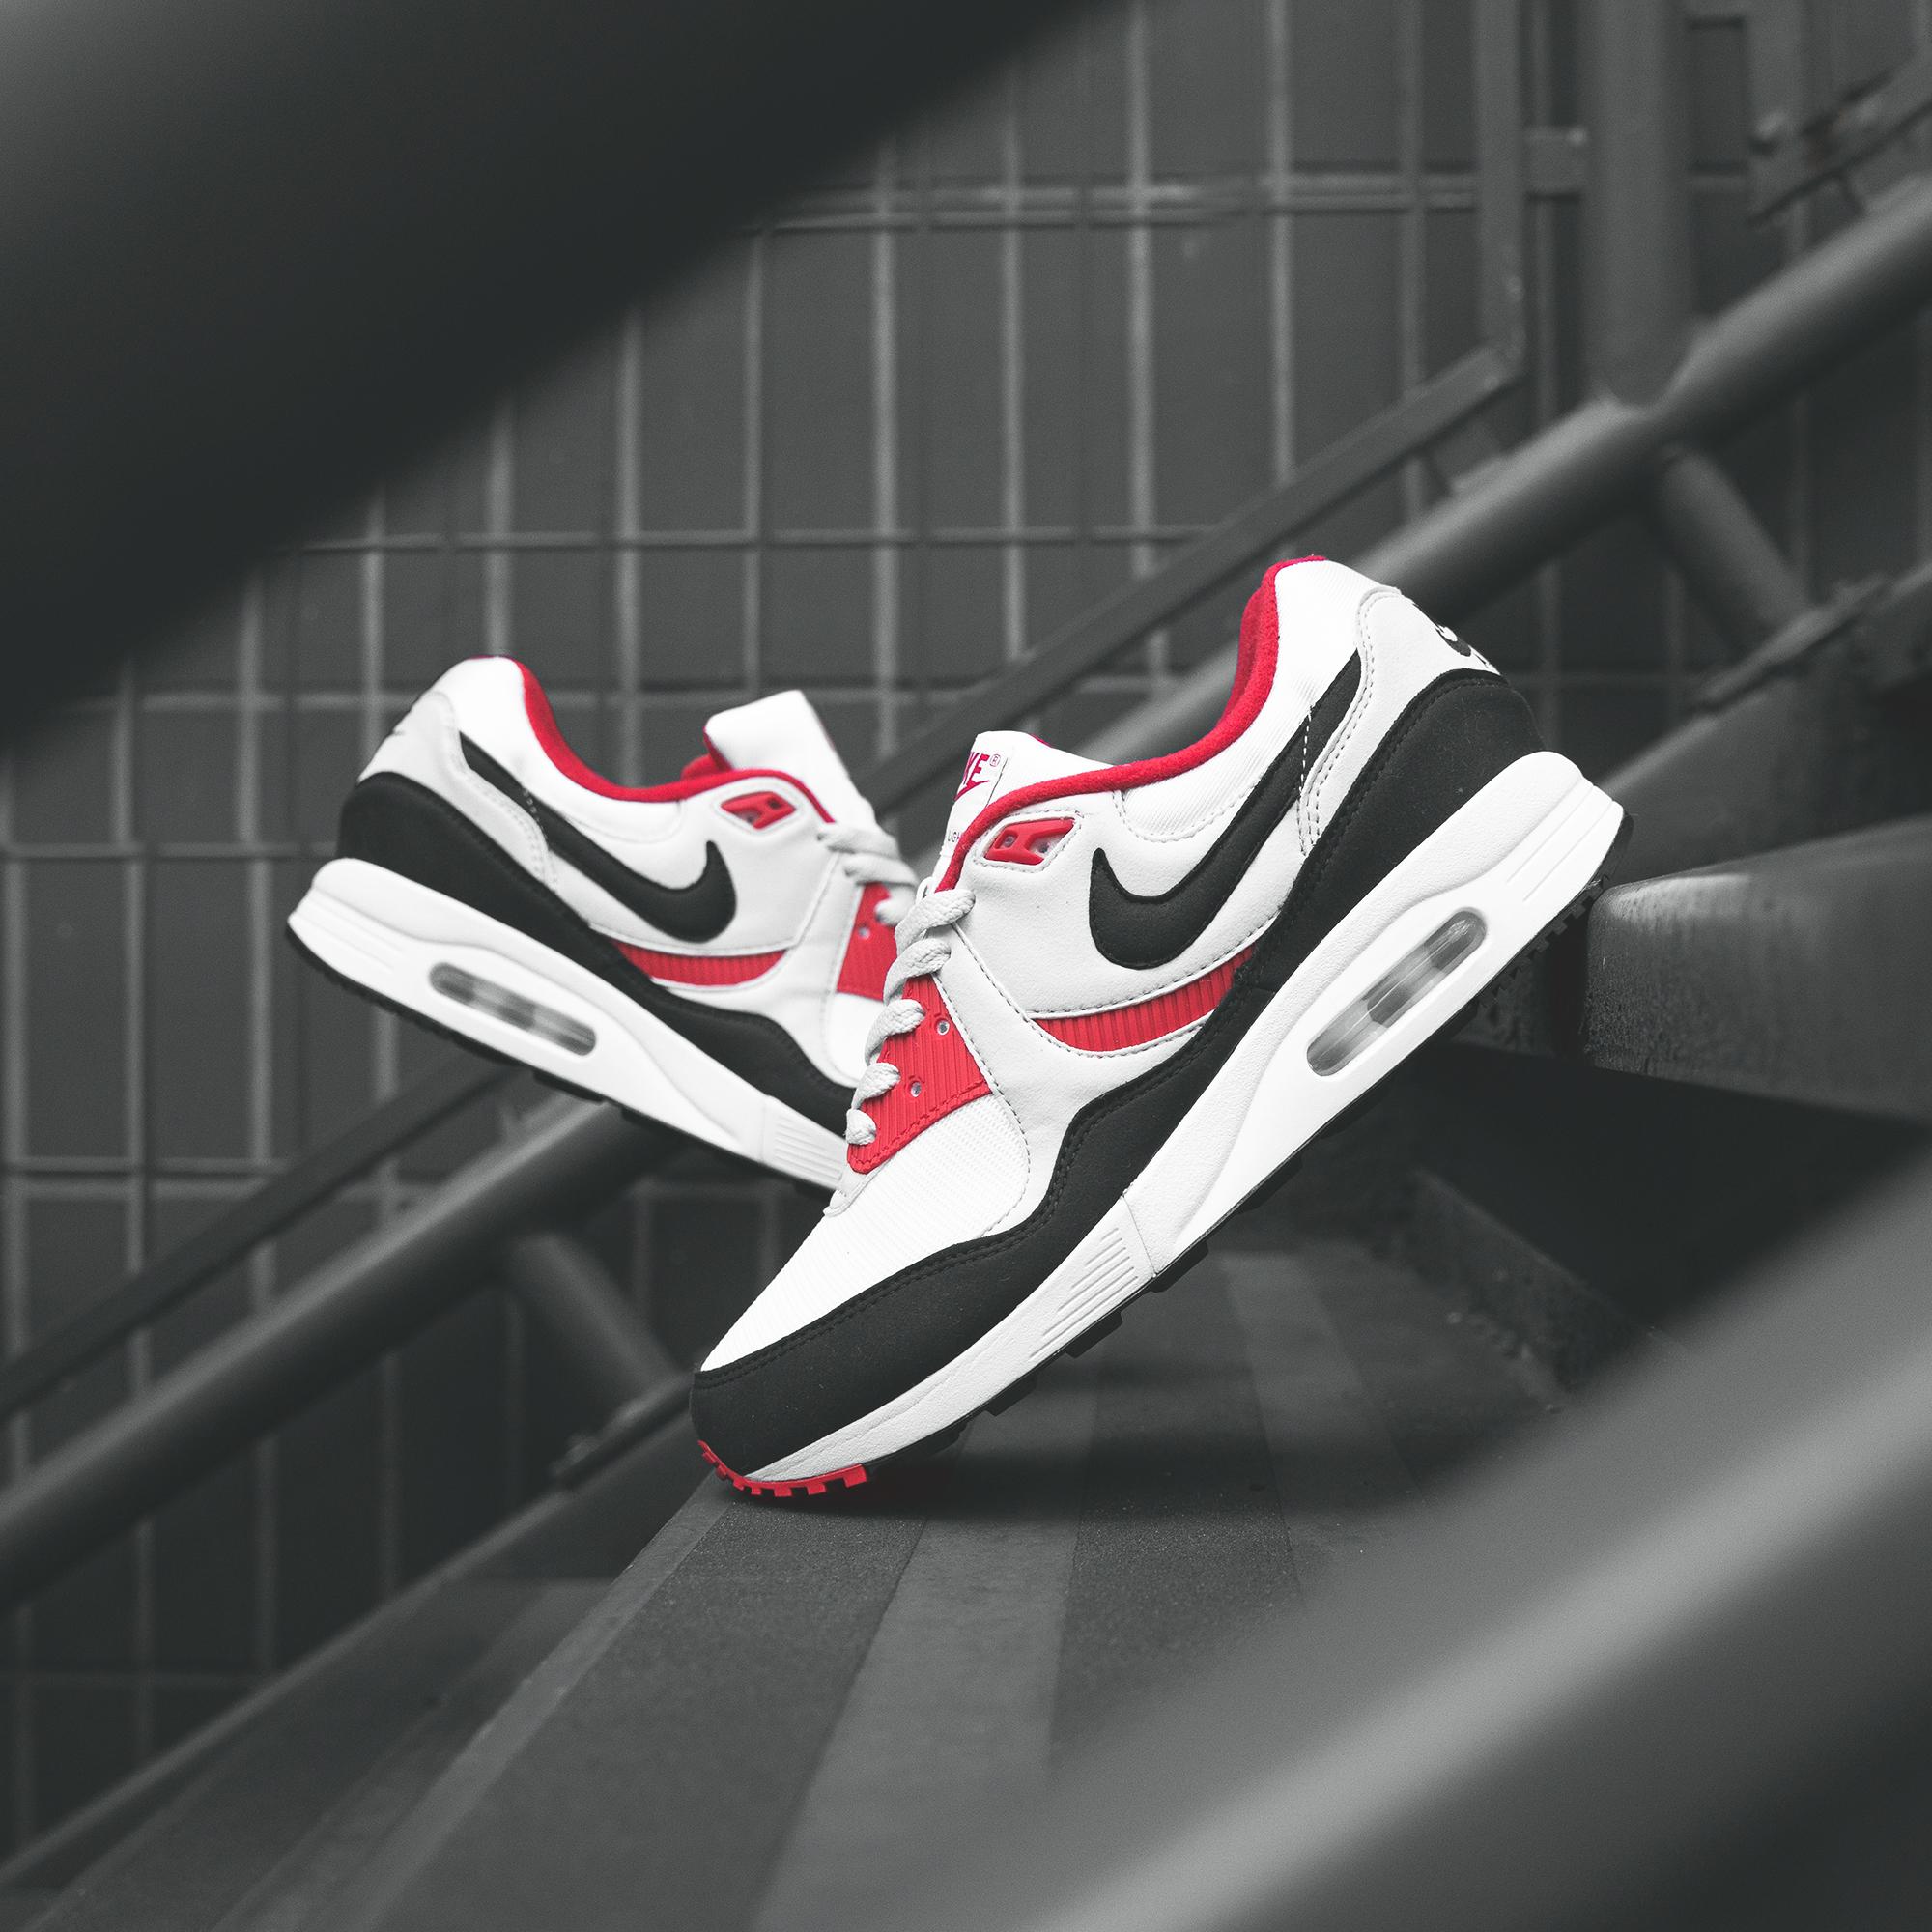 Nike Air Max Light OG | Now Available Footpatrol Blog